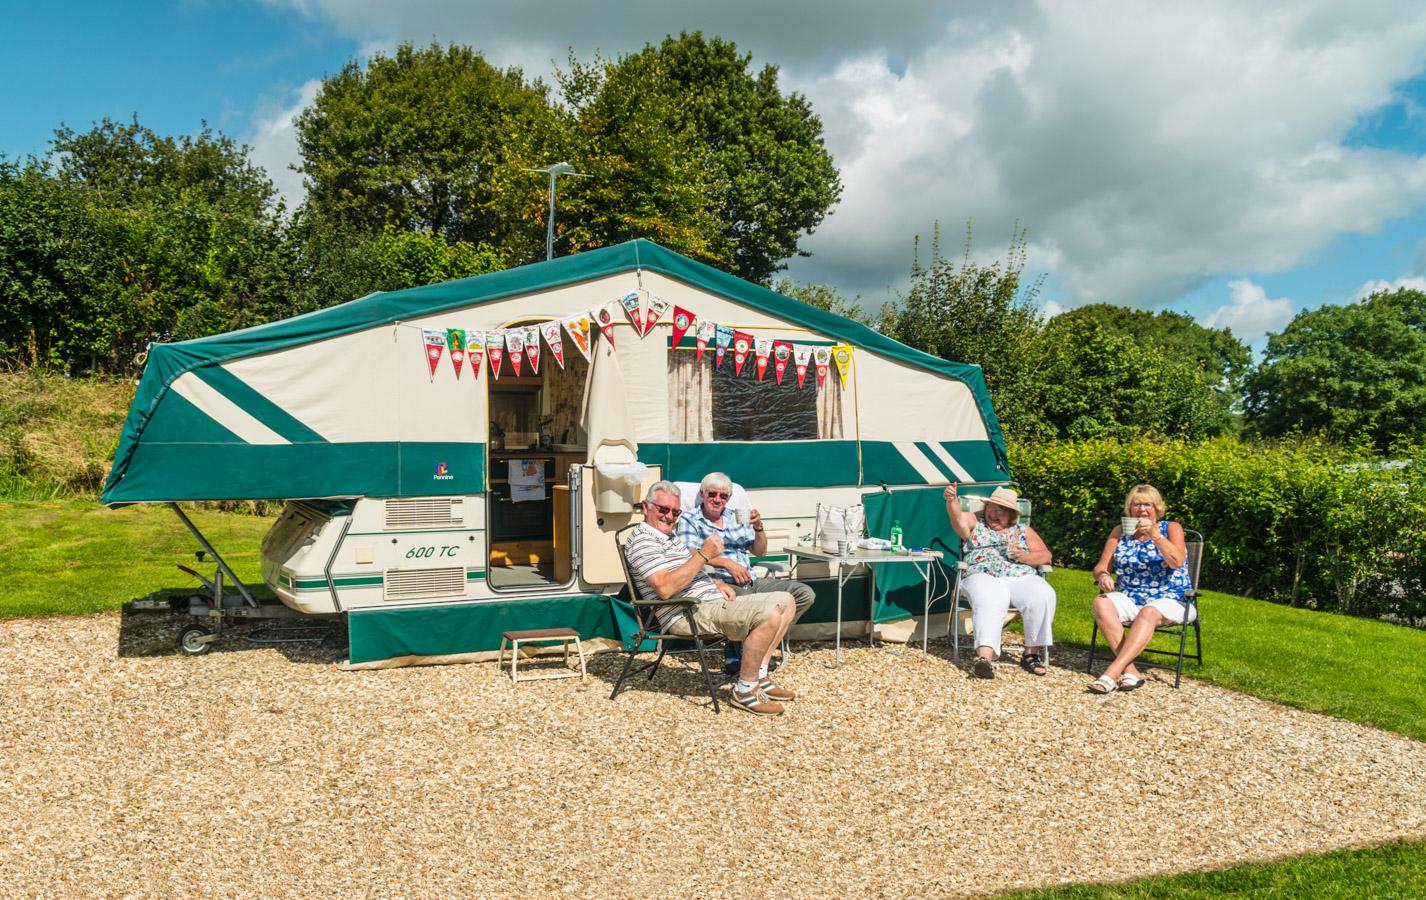 Neil-Bigwood-Monkton-Wyld-Camping-02